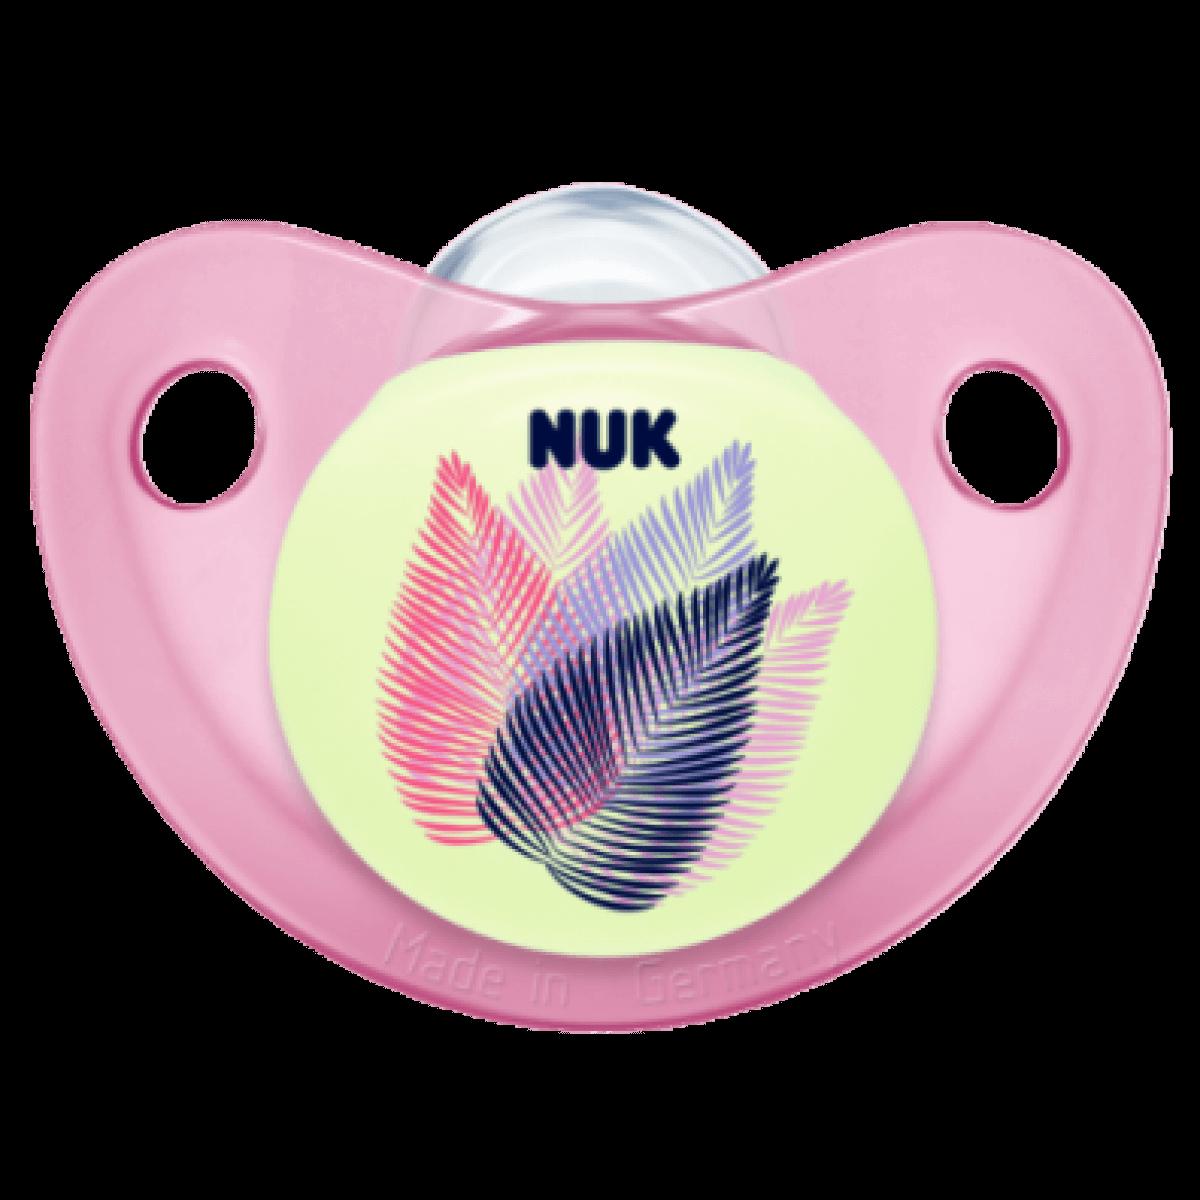 NukTrendline Night & Day Πιπίλα Σιλικόνης Χωρίς Κρίκο BPA Free – Μέγεθος 1 (0-6 μηνών)